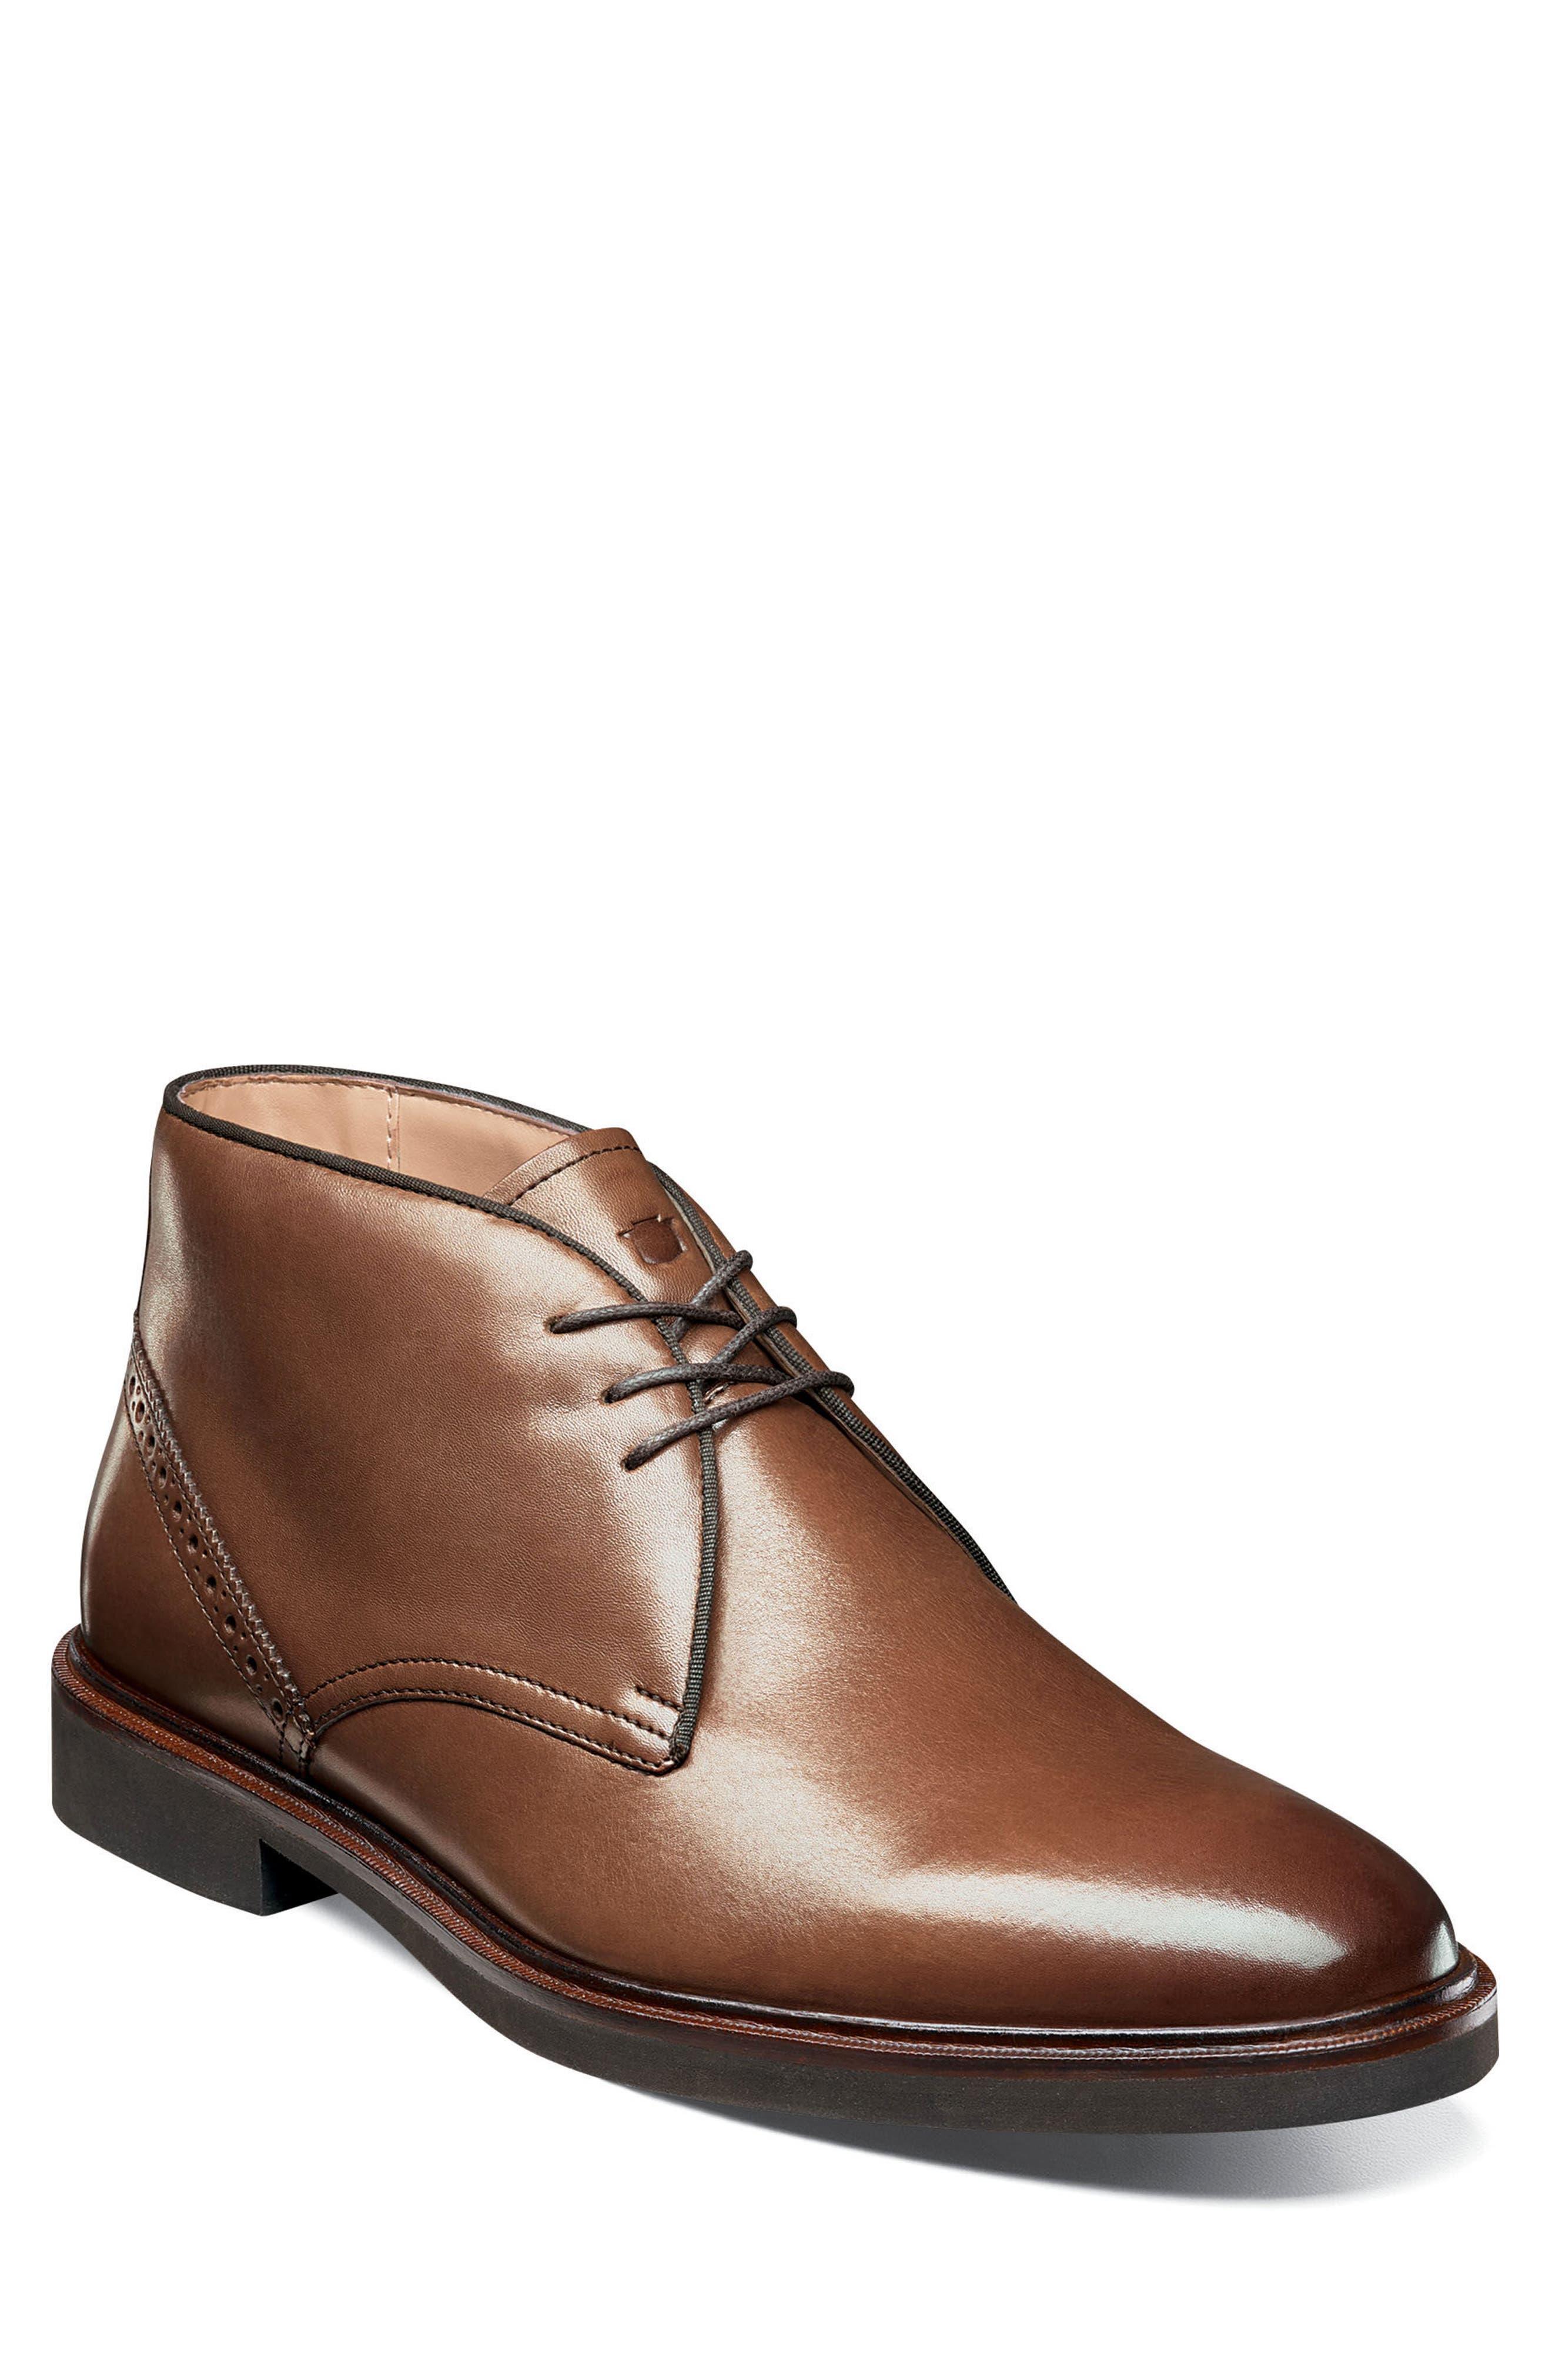 Truman Chukka Boot,                         Main,                         color,